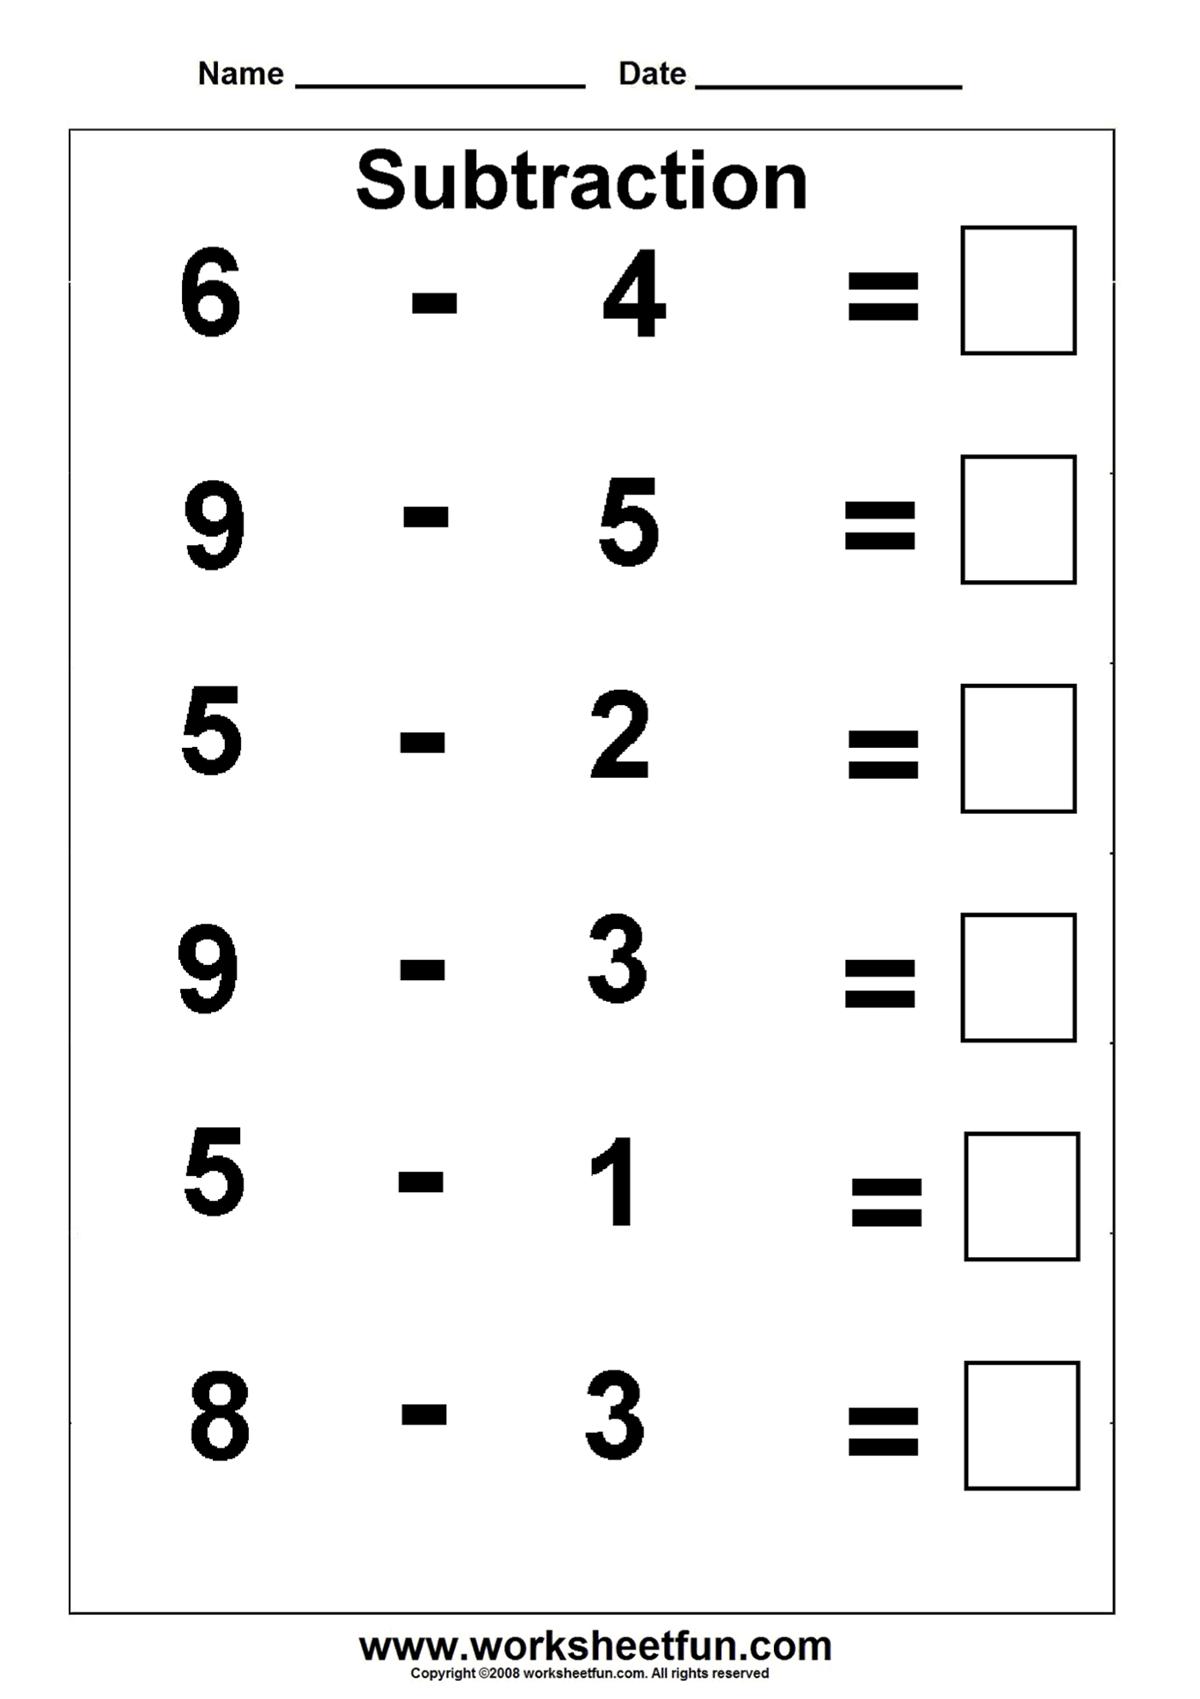 subtraction worksheet homeschooling subtraction kindergarten math worksheets subtraction. Black Bedroom Furniture Sets. Home Design Ideas